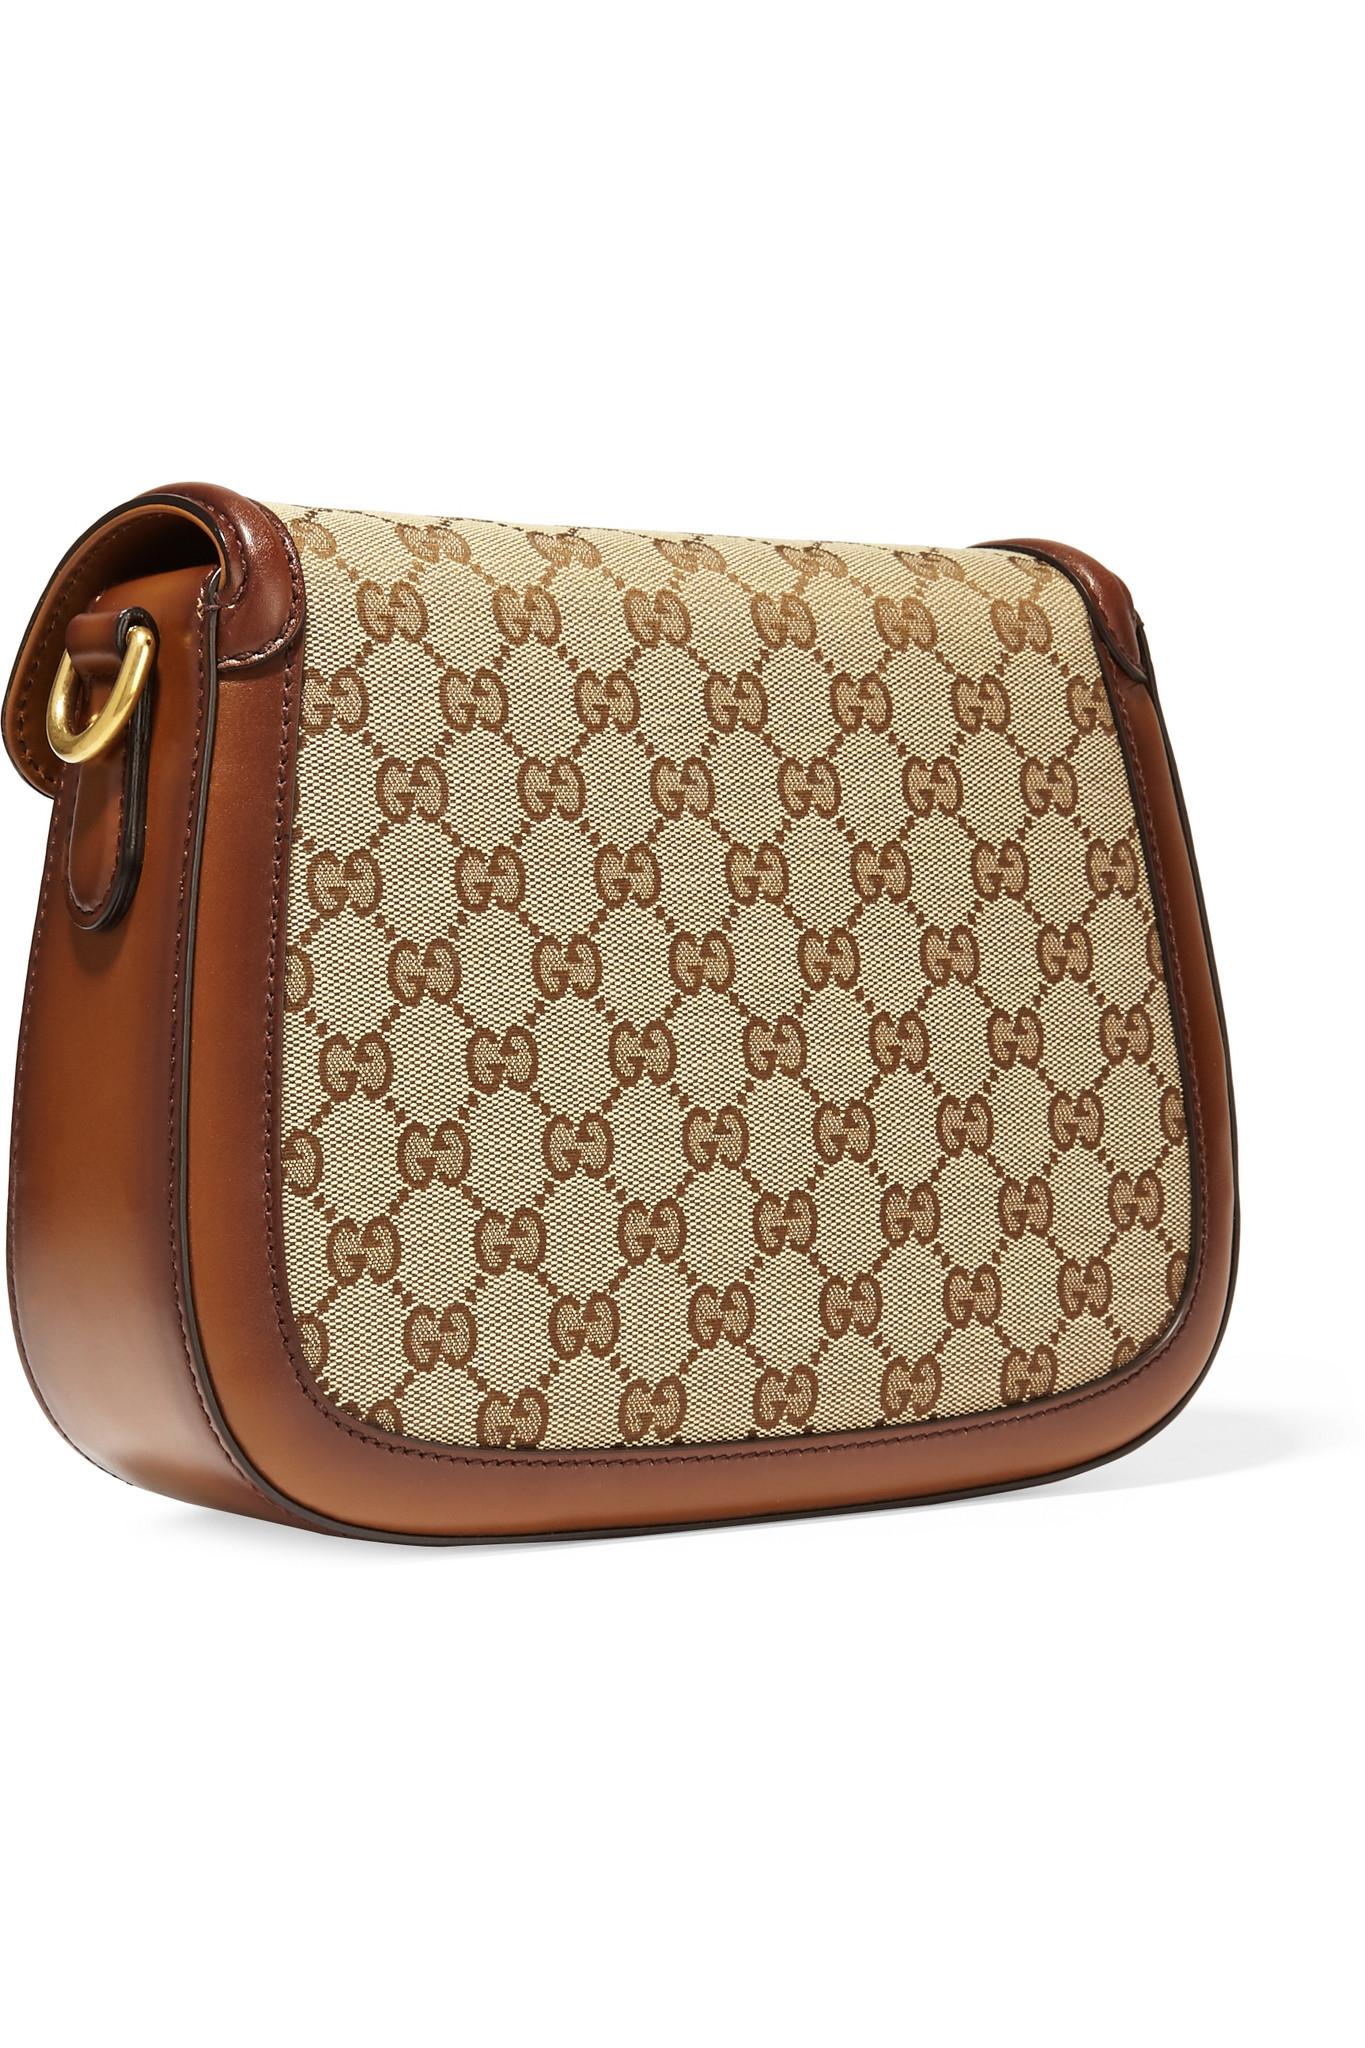 98c67f14a4 Gucci Lady Web Medium Coated Canvas Shoulder Bag in Brown - Lyst